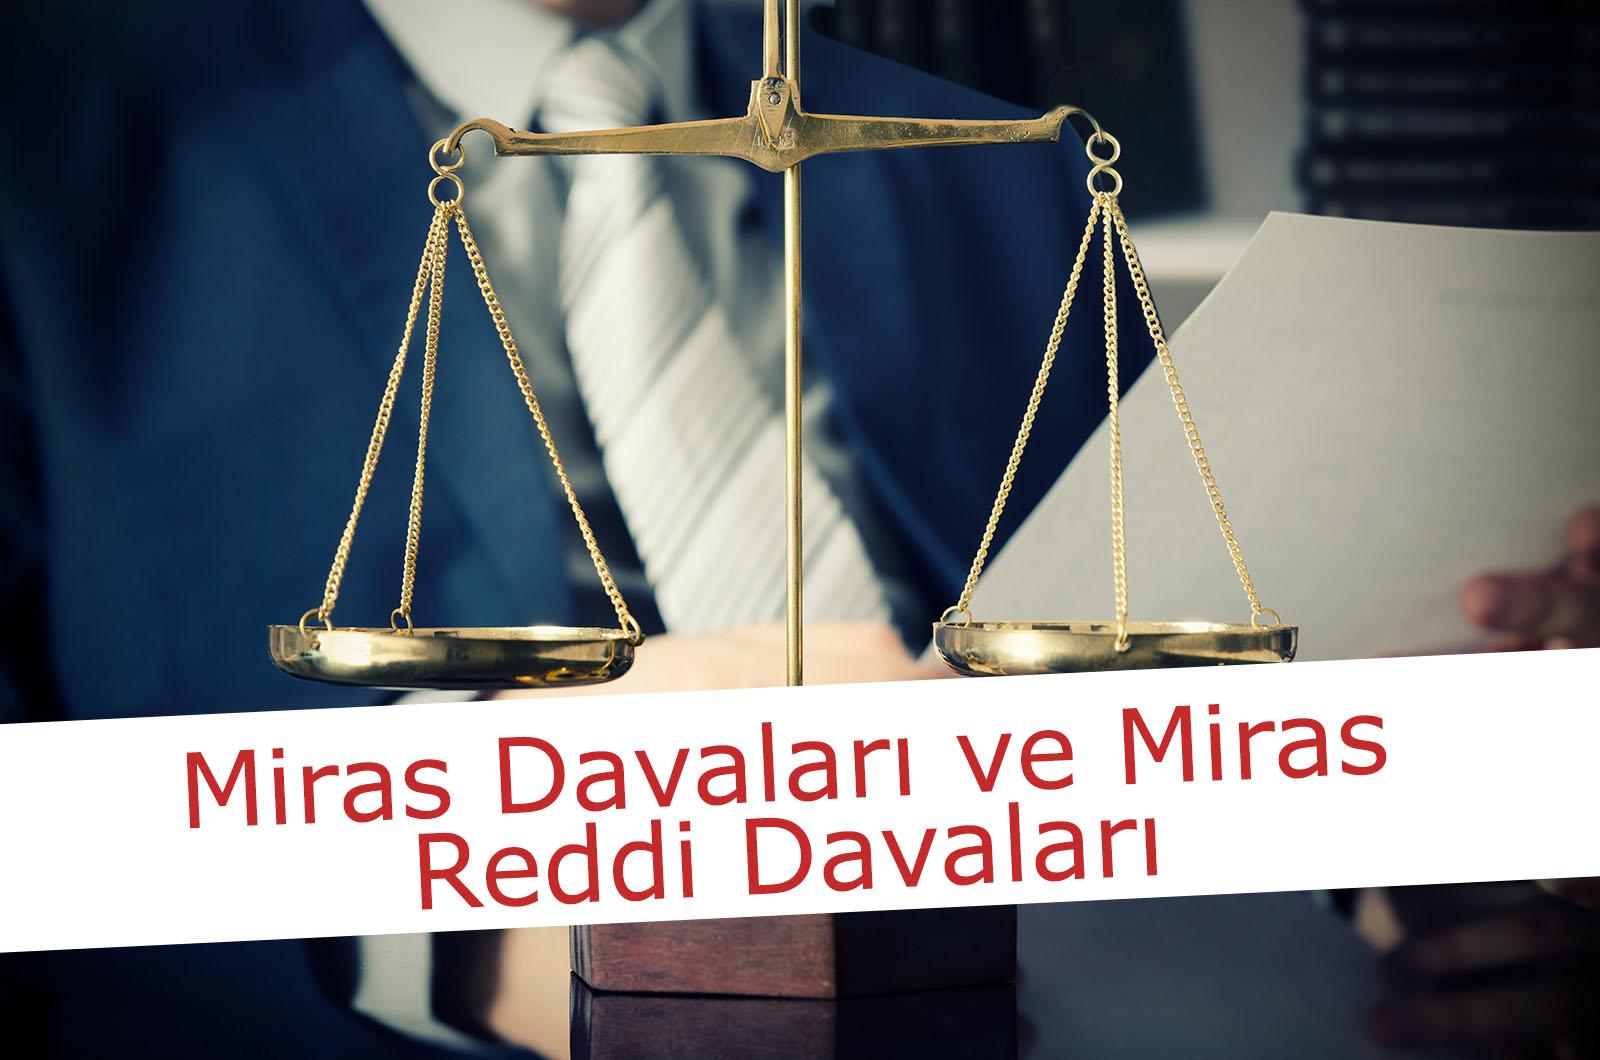 reddi miras davası - miras avukatı bursa